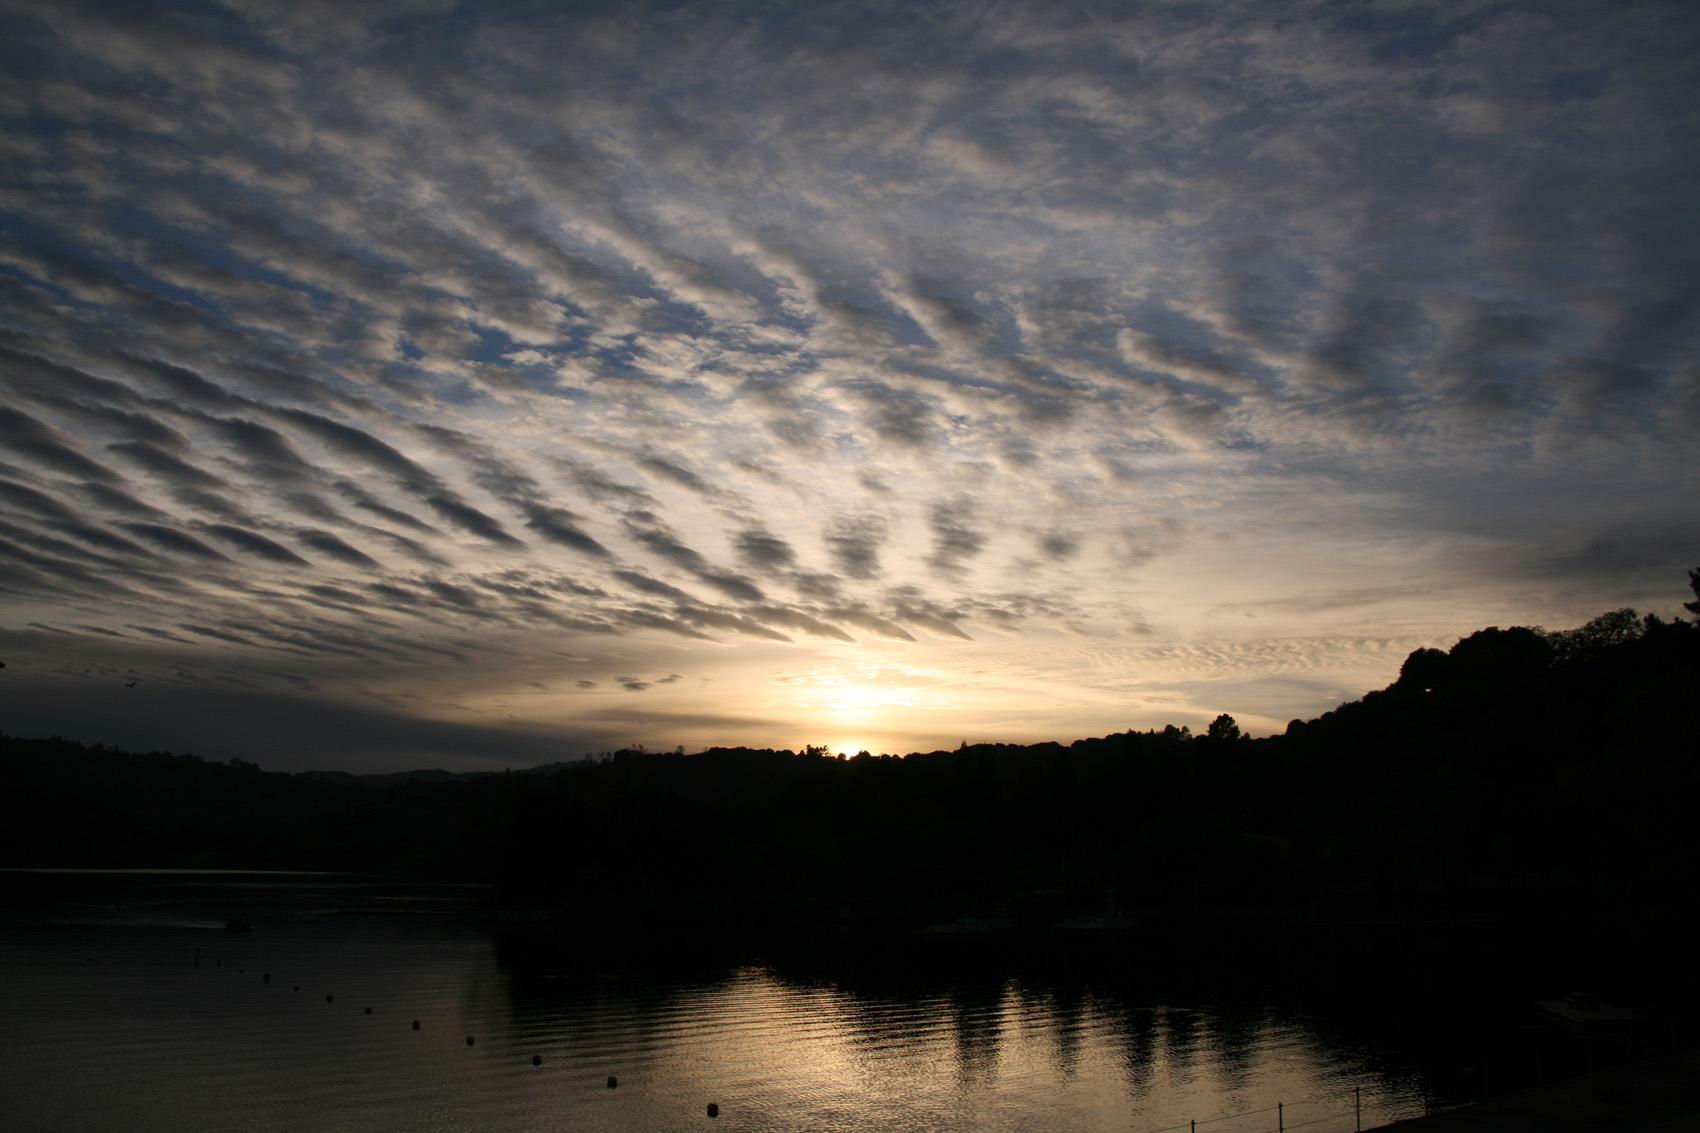 Sunset, 1700x1133